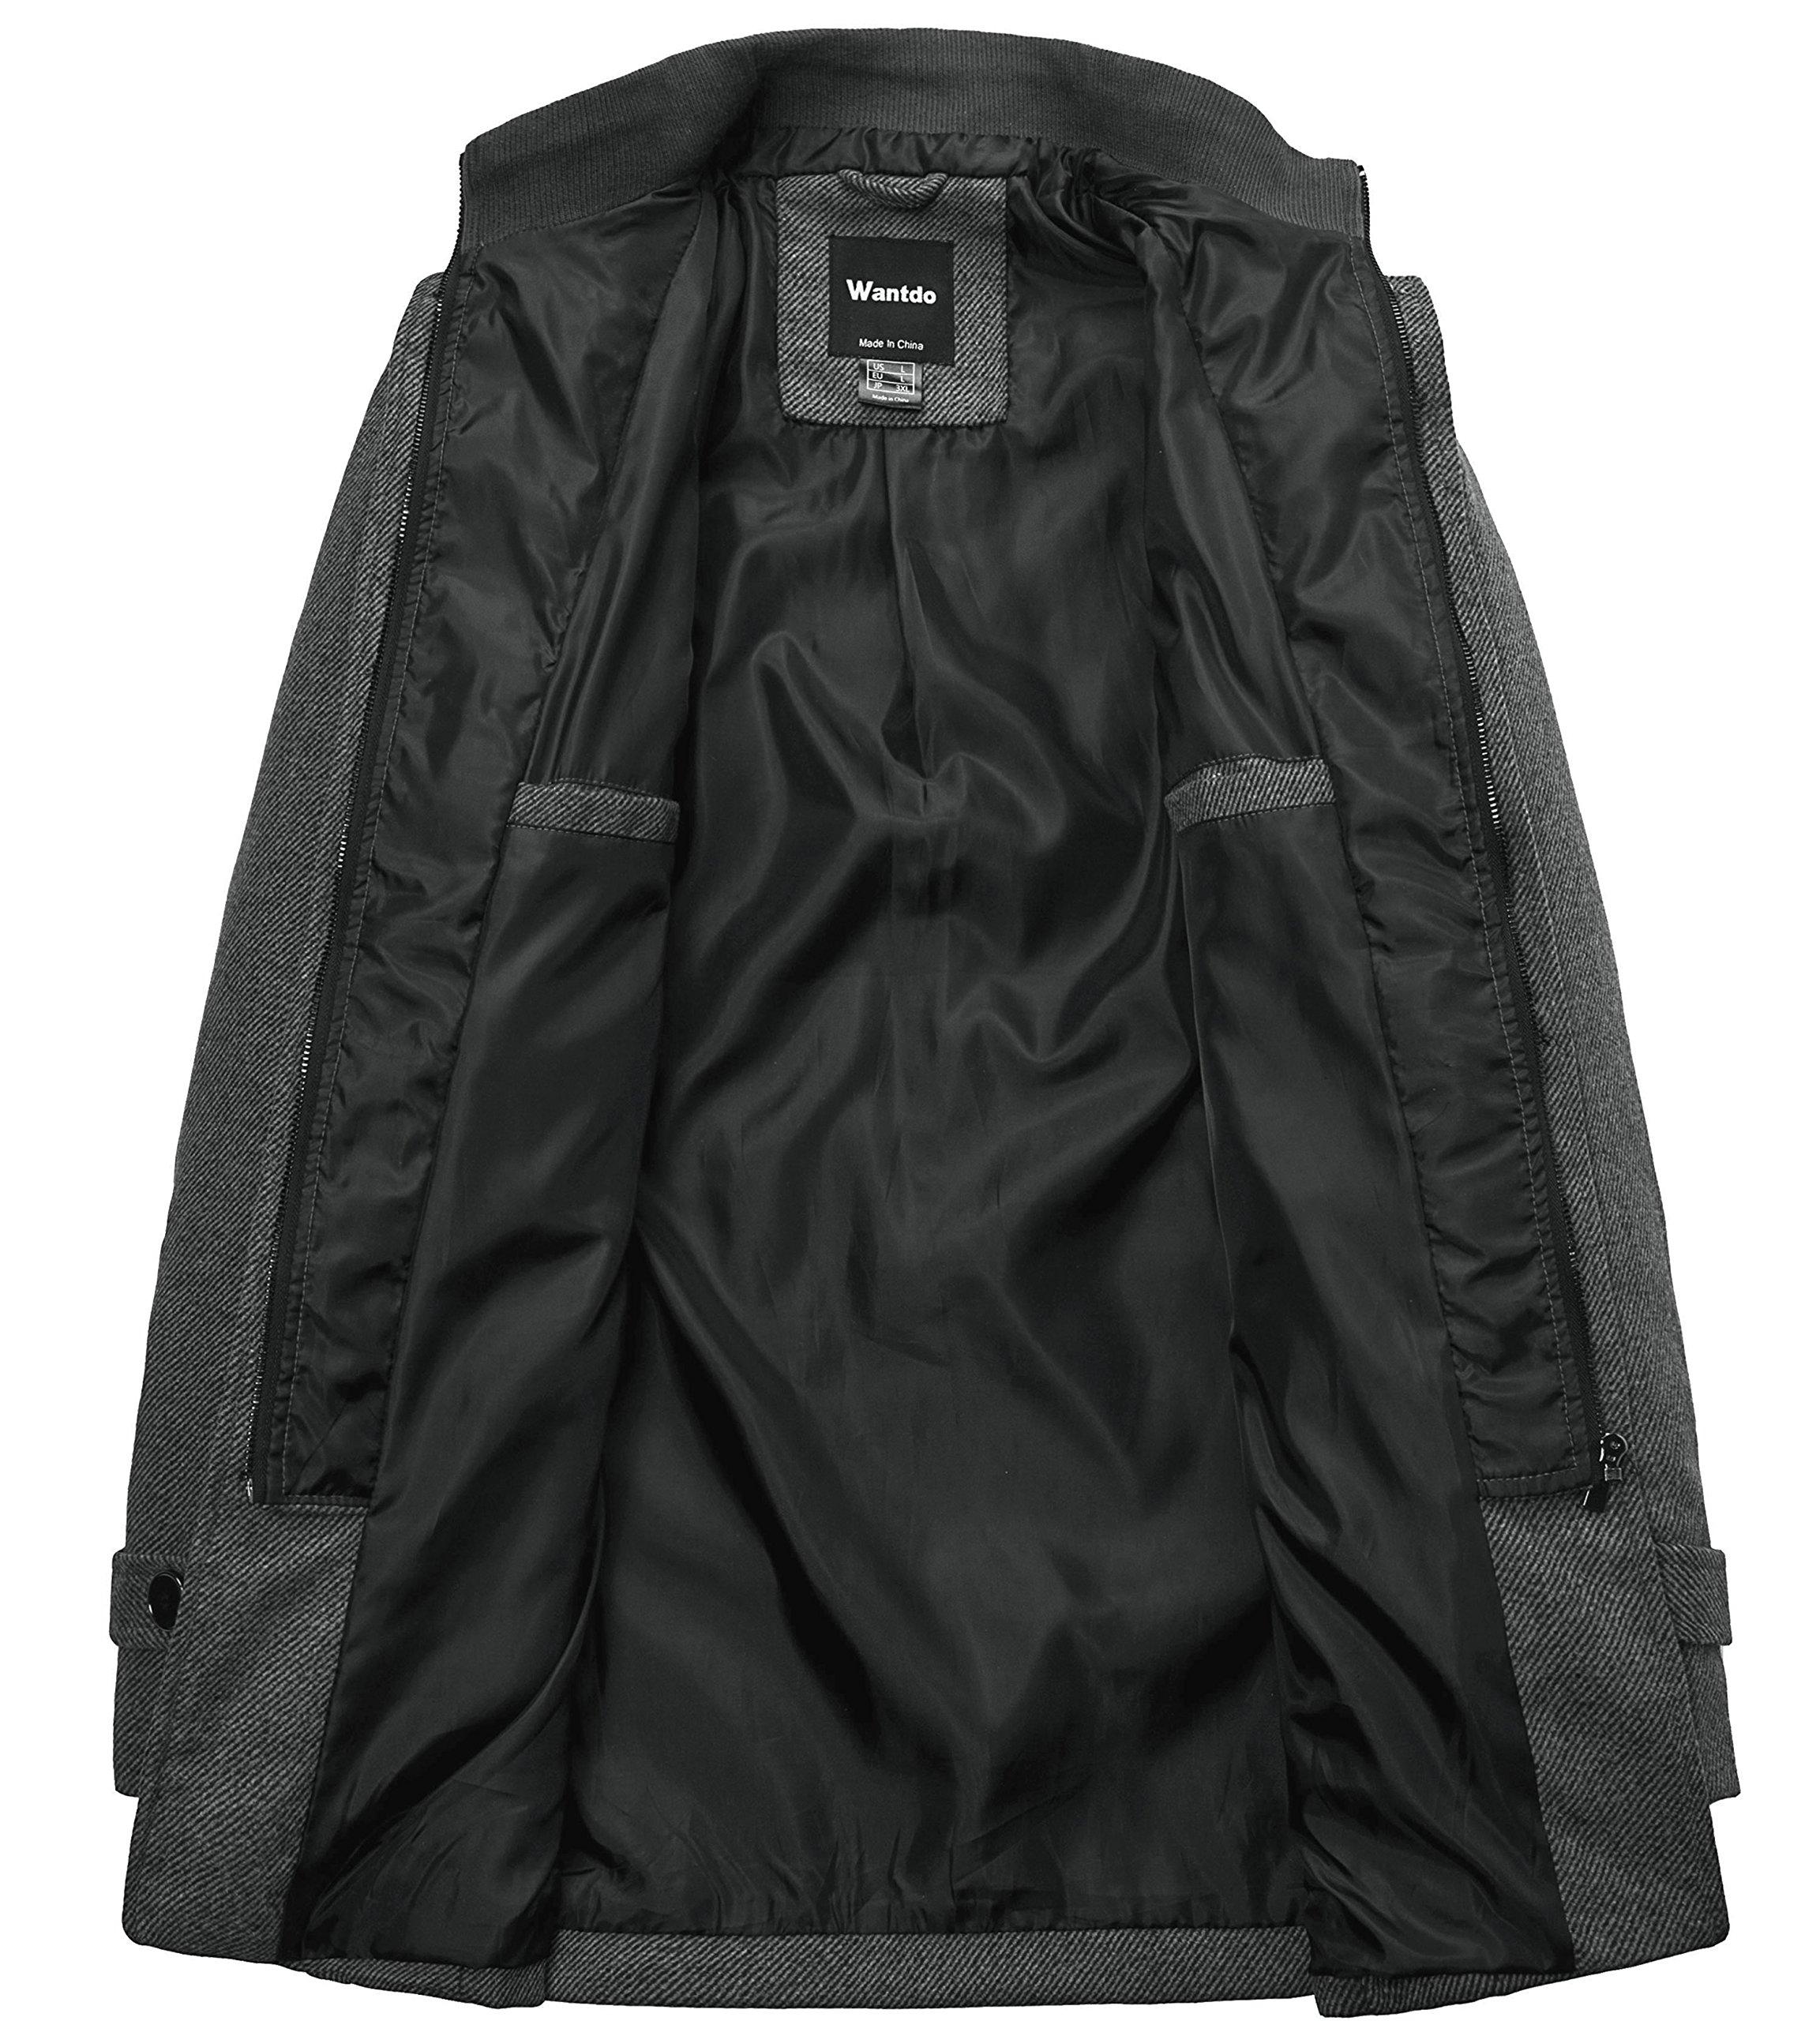 Wantdo Men's Wool Coat Stand Collar Windproof Jacket Overcoat Grey Large by Wantdo (Image #3)